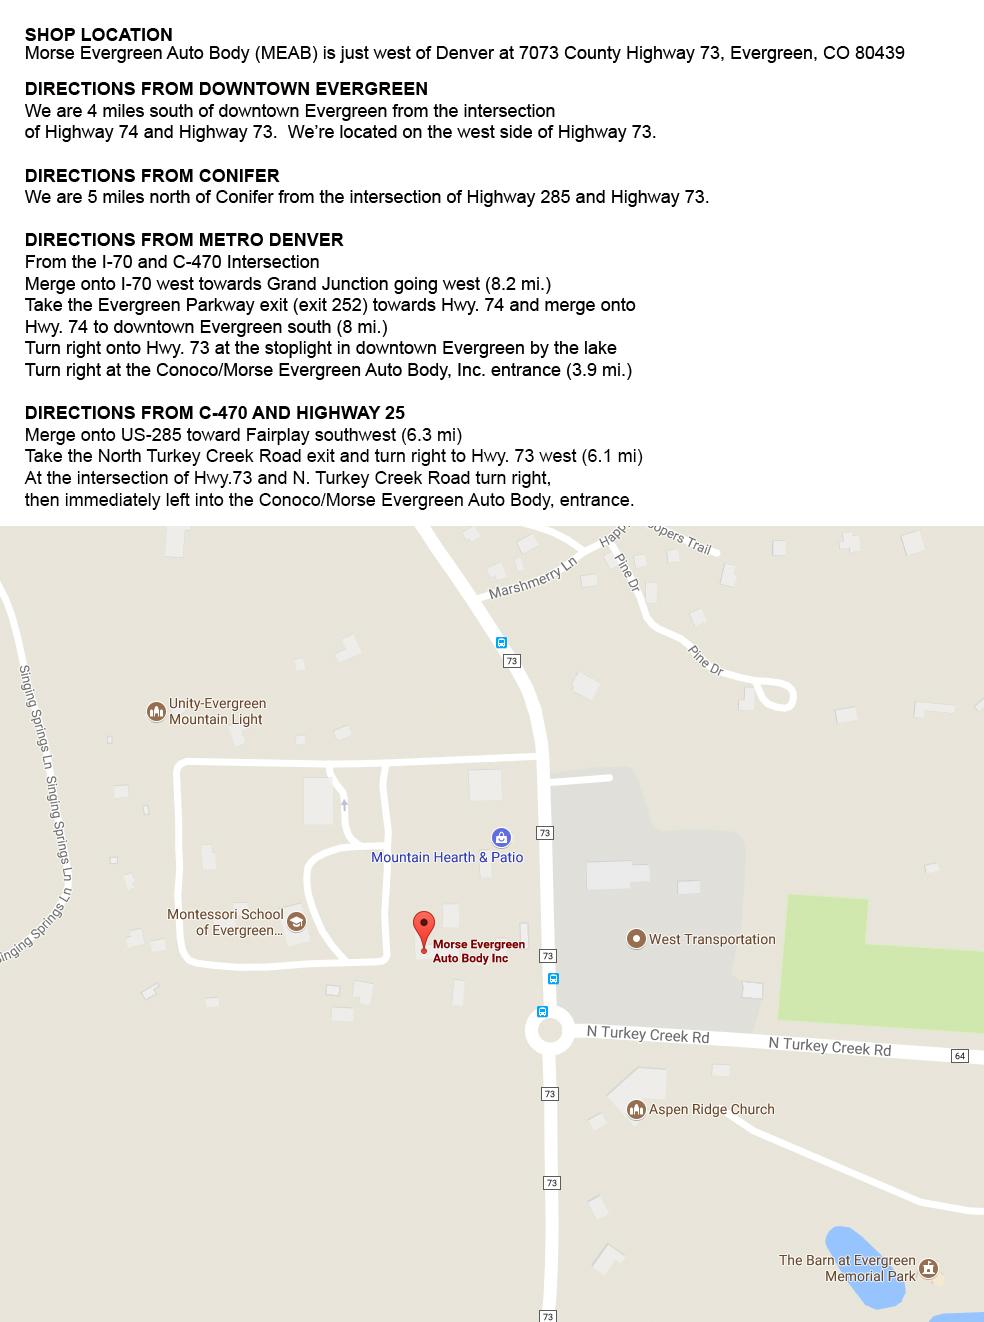 Google Location Map.jpg